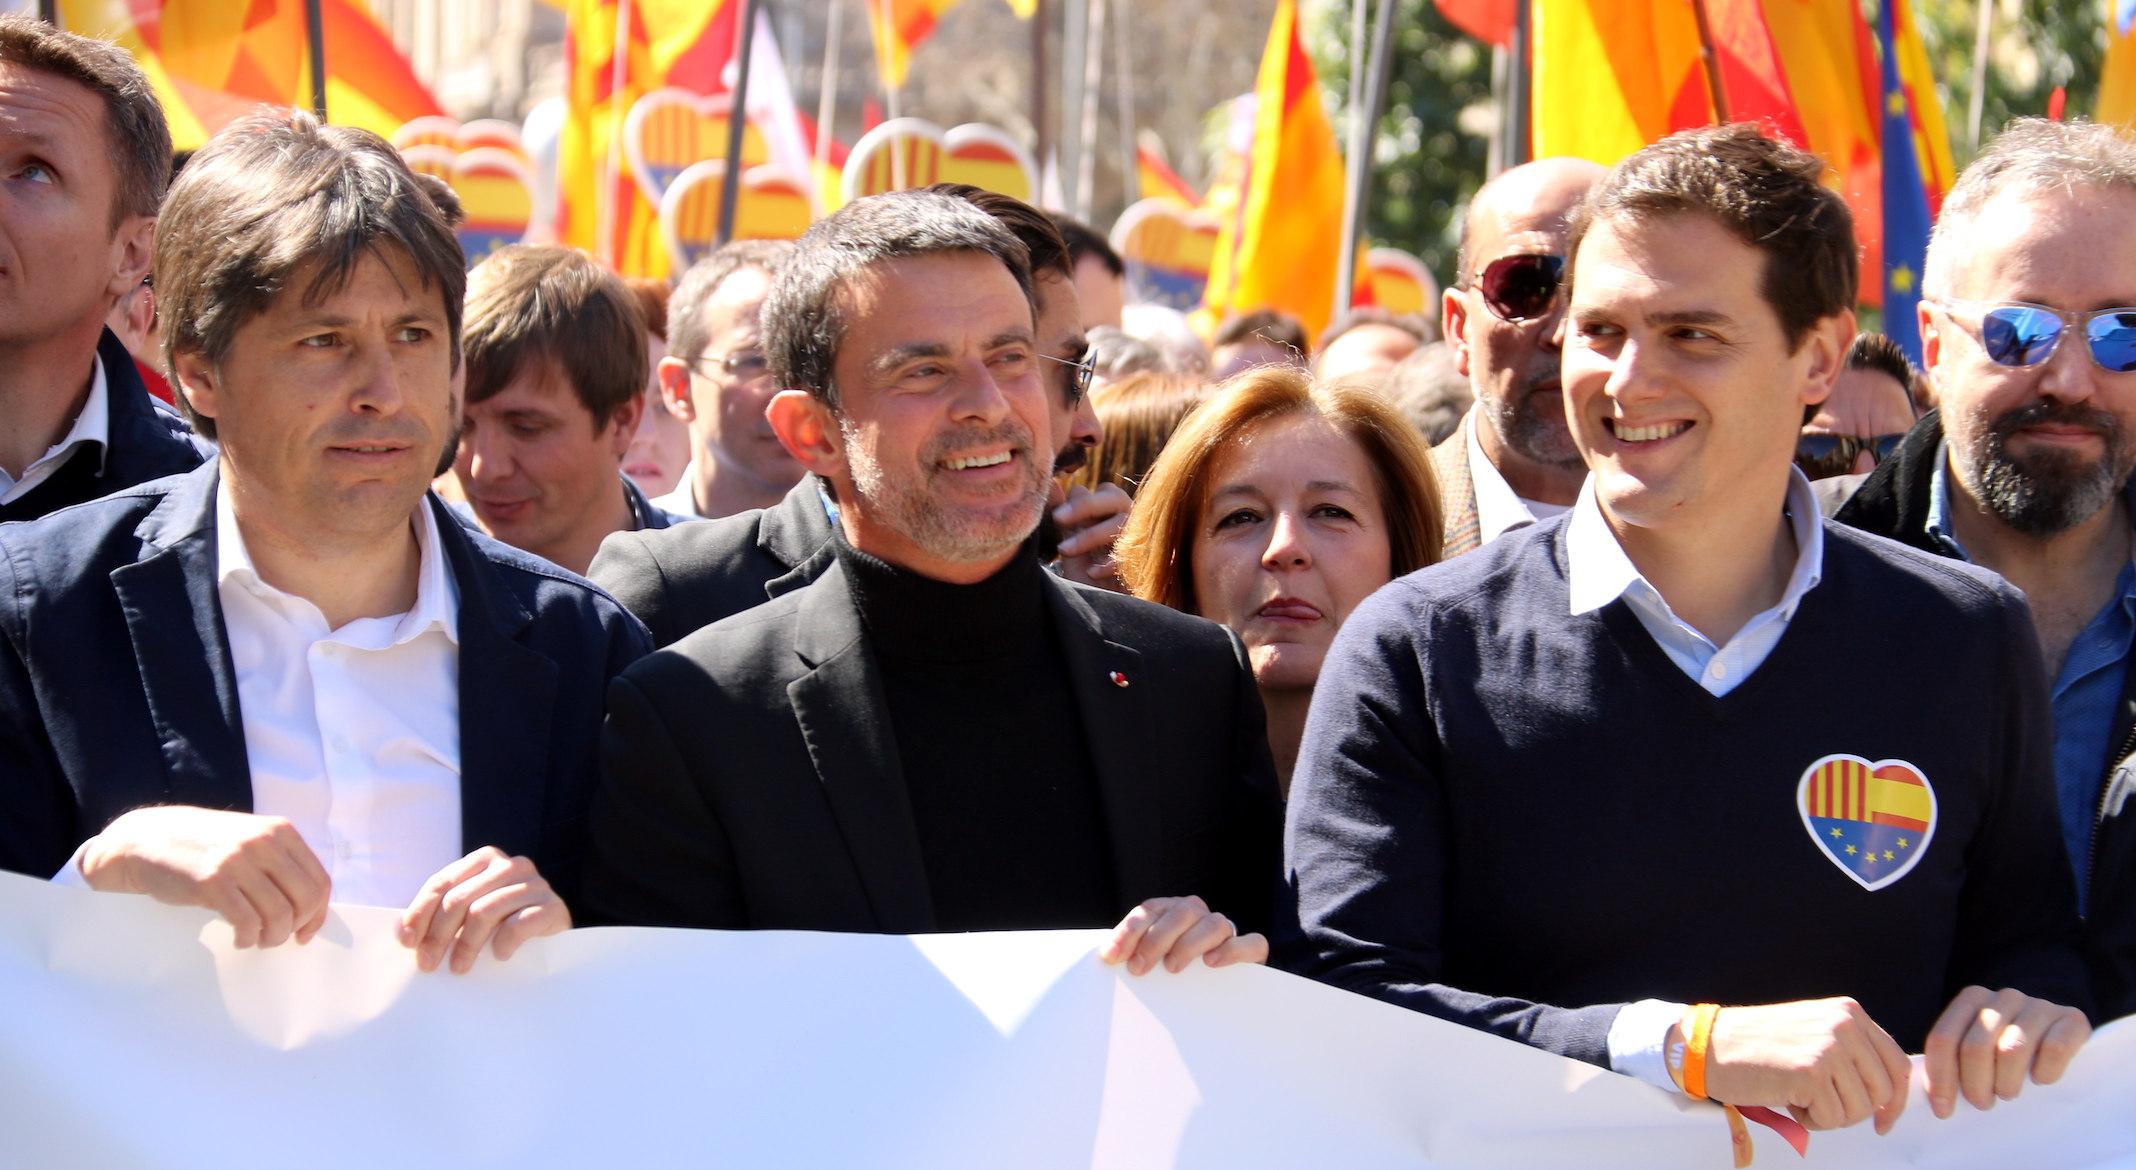 ¿Cuánto mide Manuel Valls? - Real height Manuel-valls-al-centre-a-la-mani-scc-acn-0